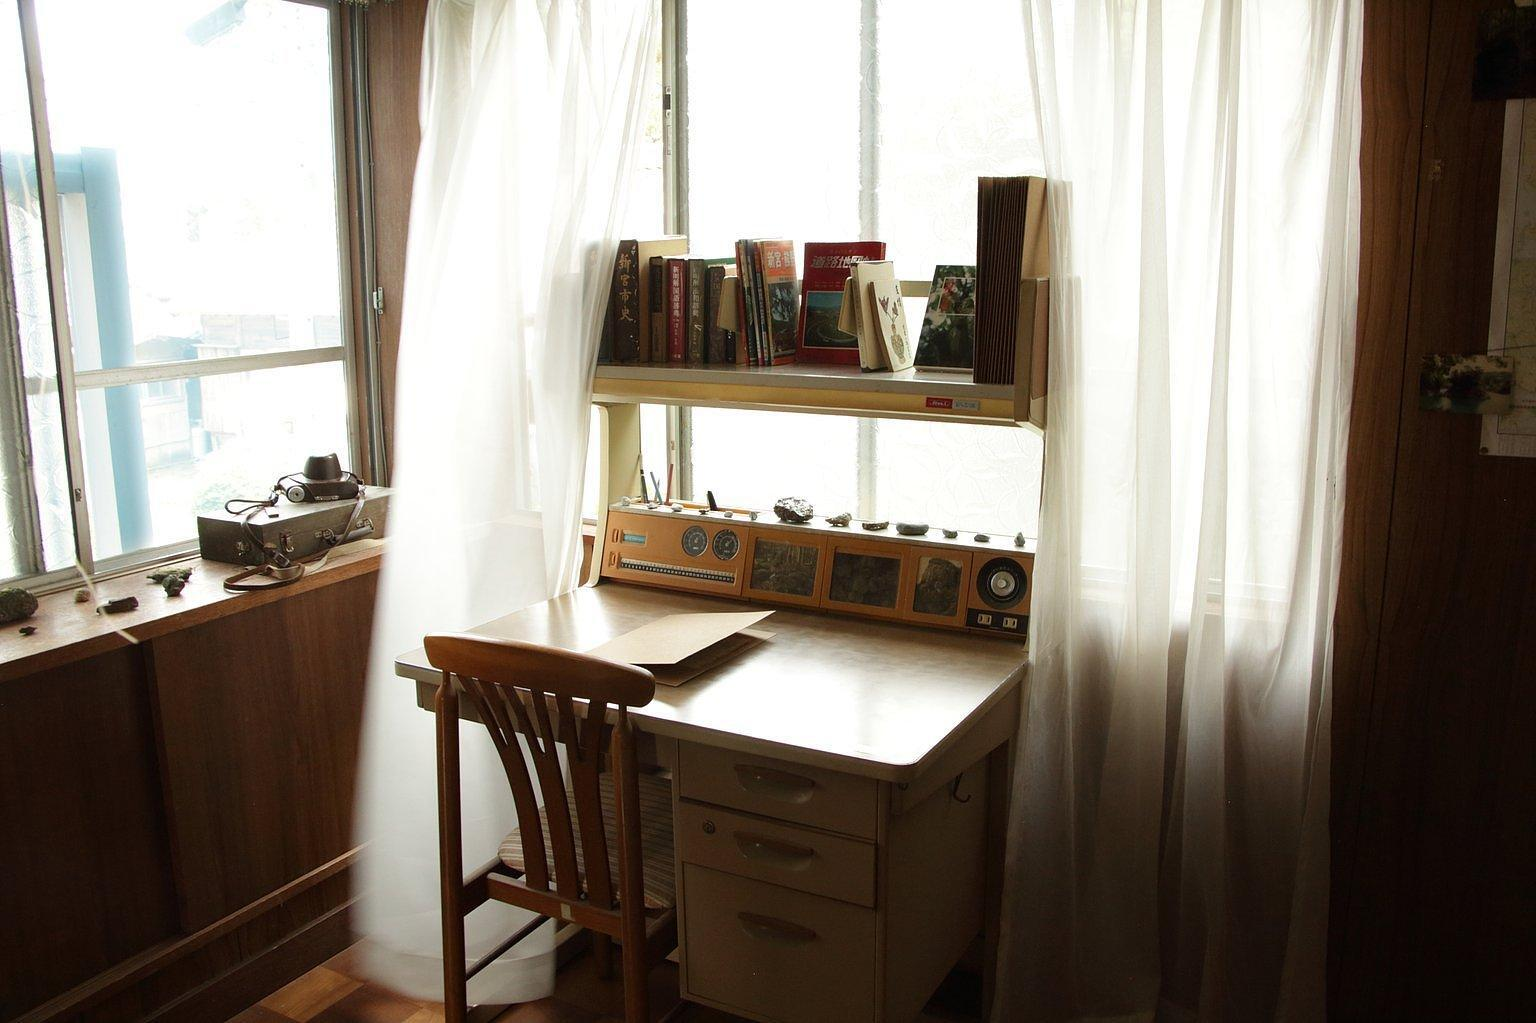 和歌山県の神倉書斎